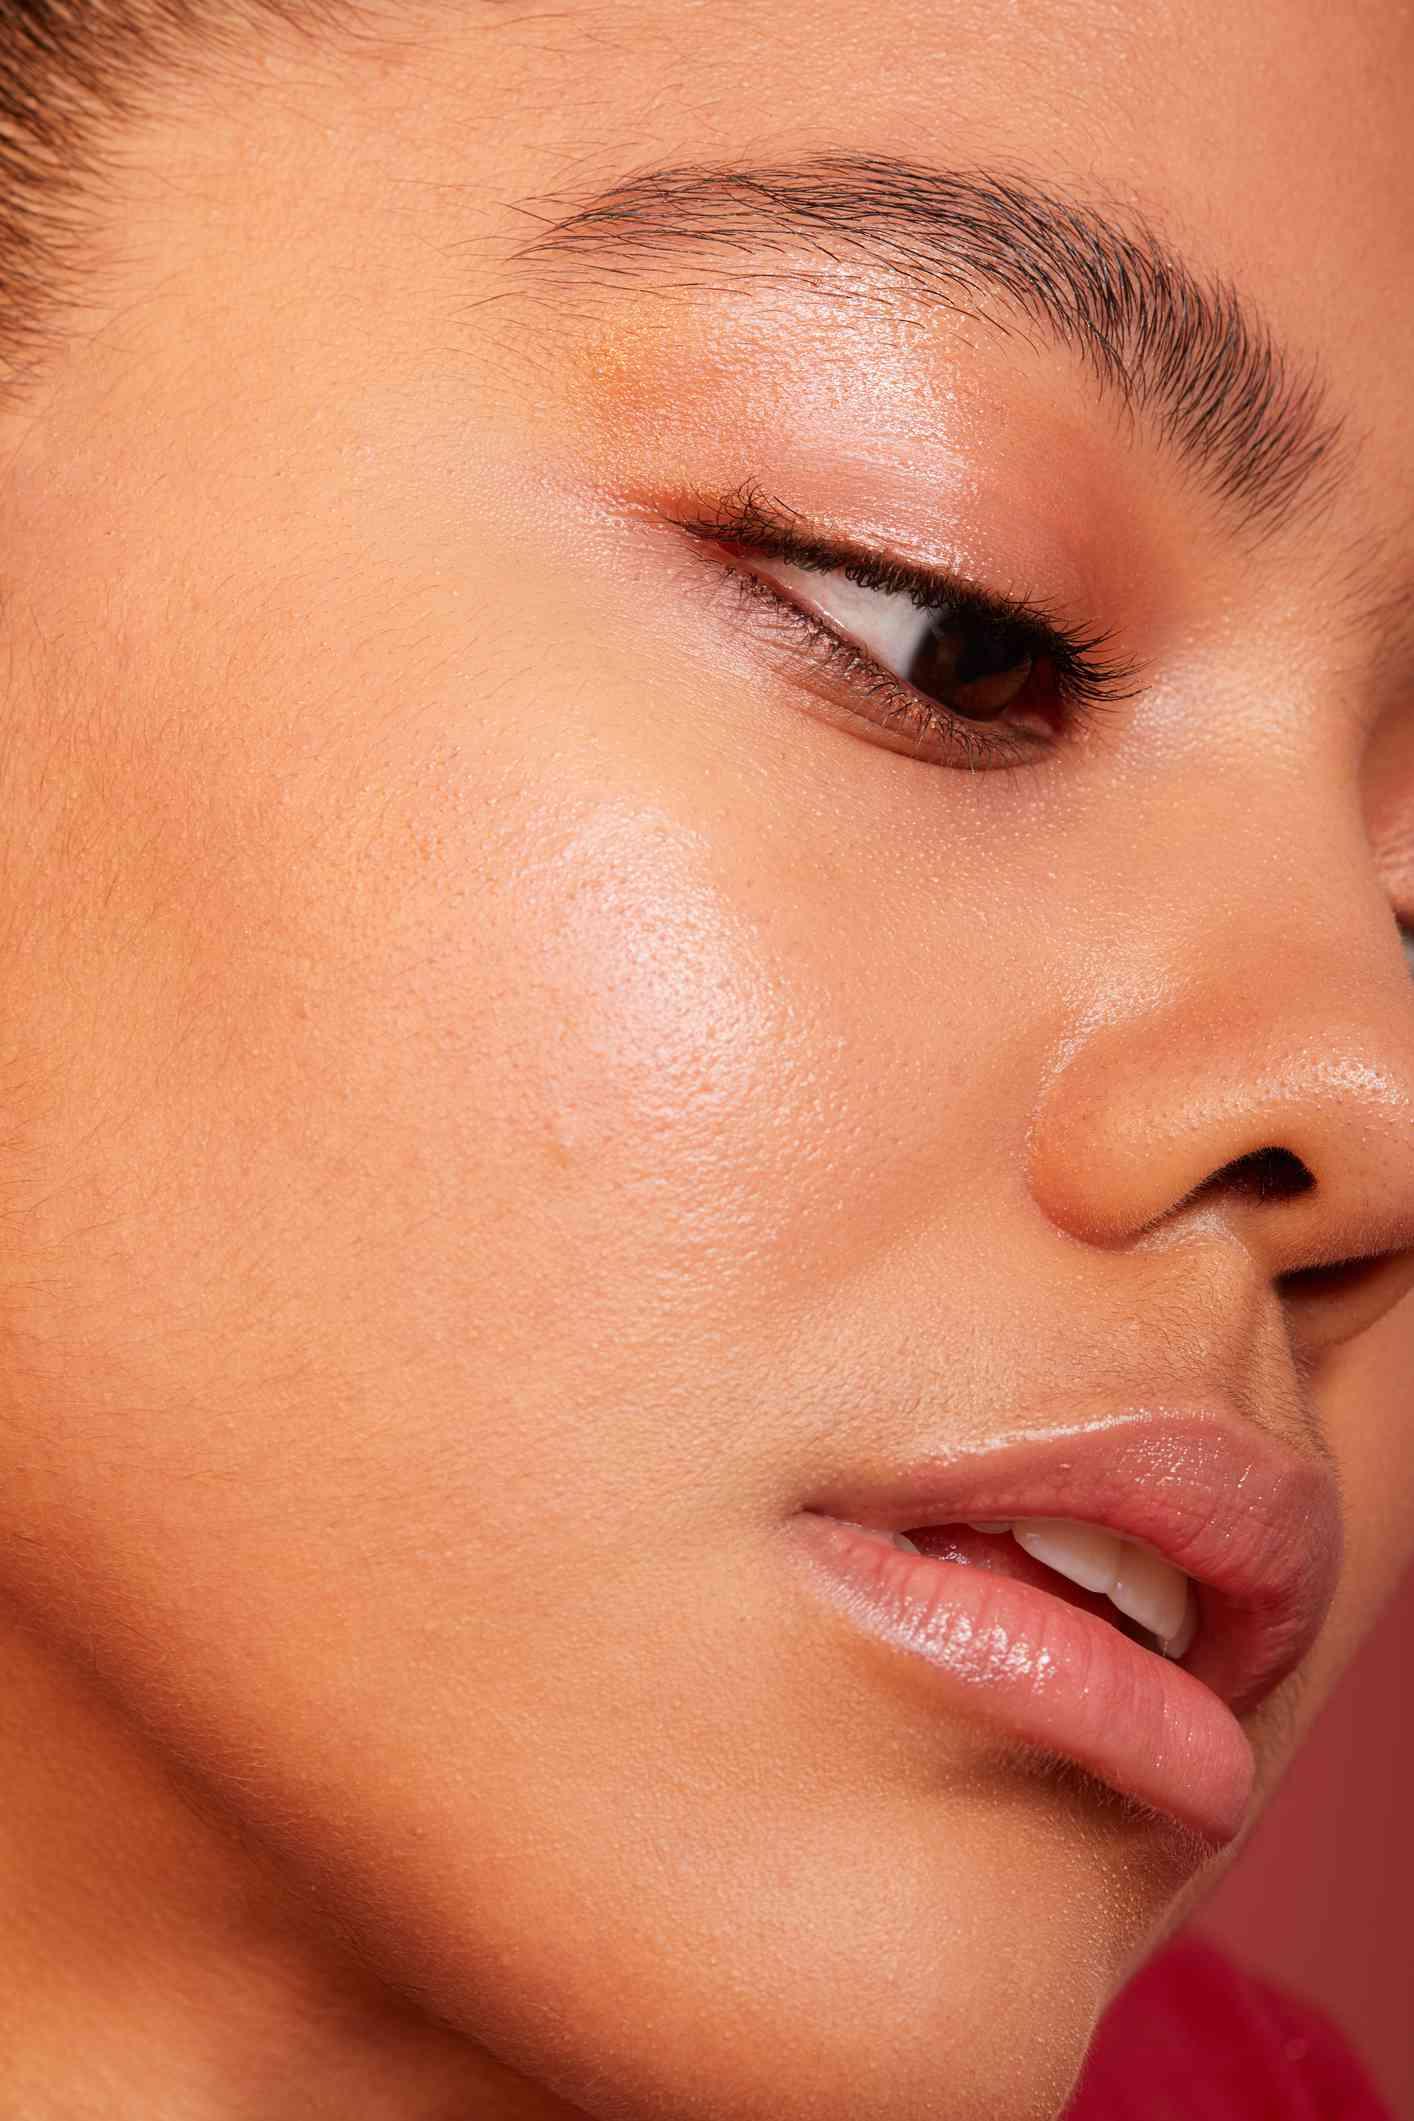 closeup of flawless skin and no-makeup look